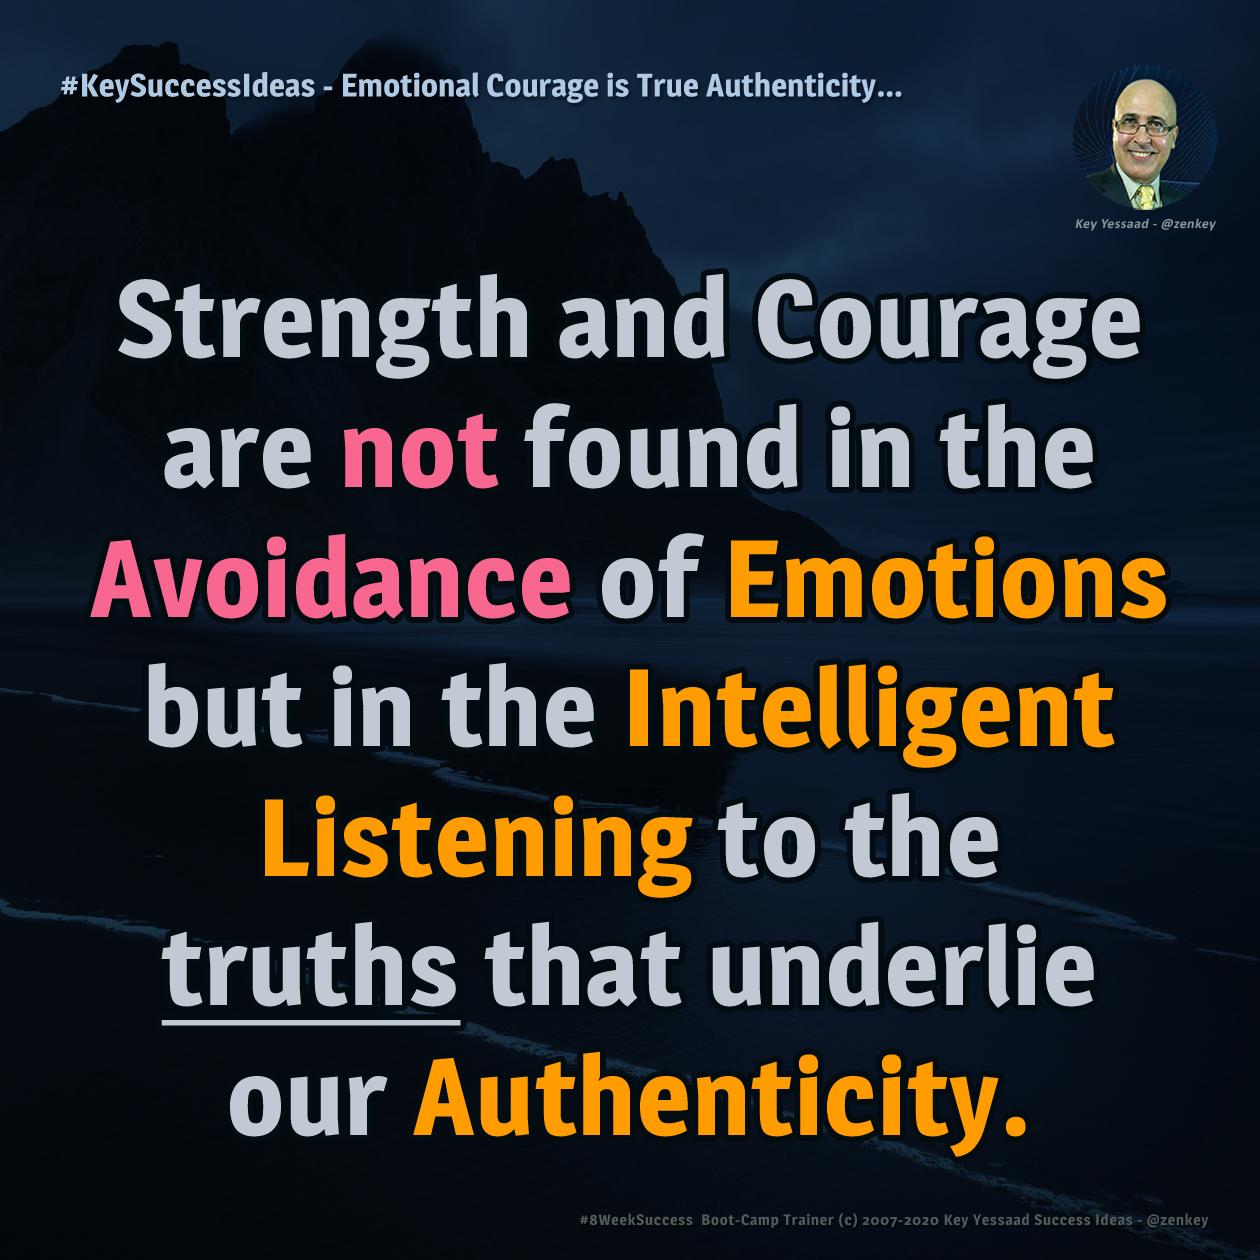 Emotional Courage is True Authenticity... - #KeySuccessIdeas